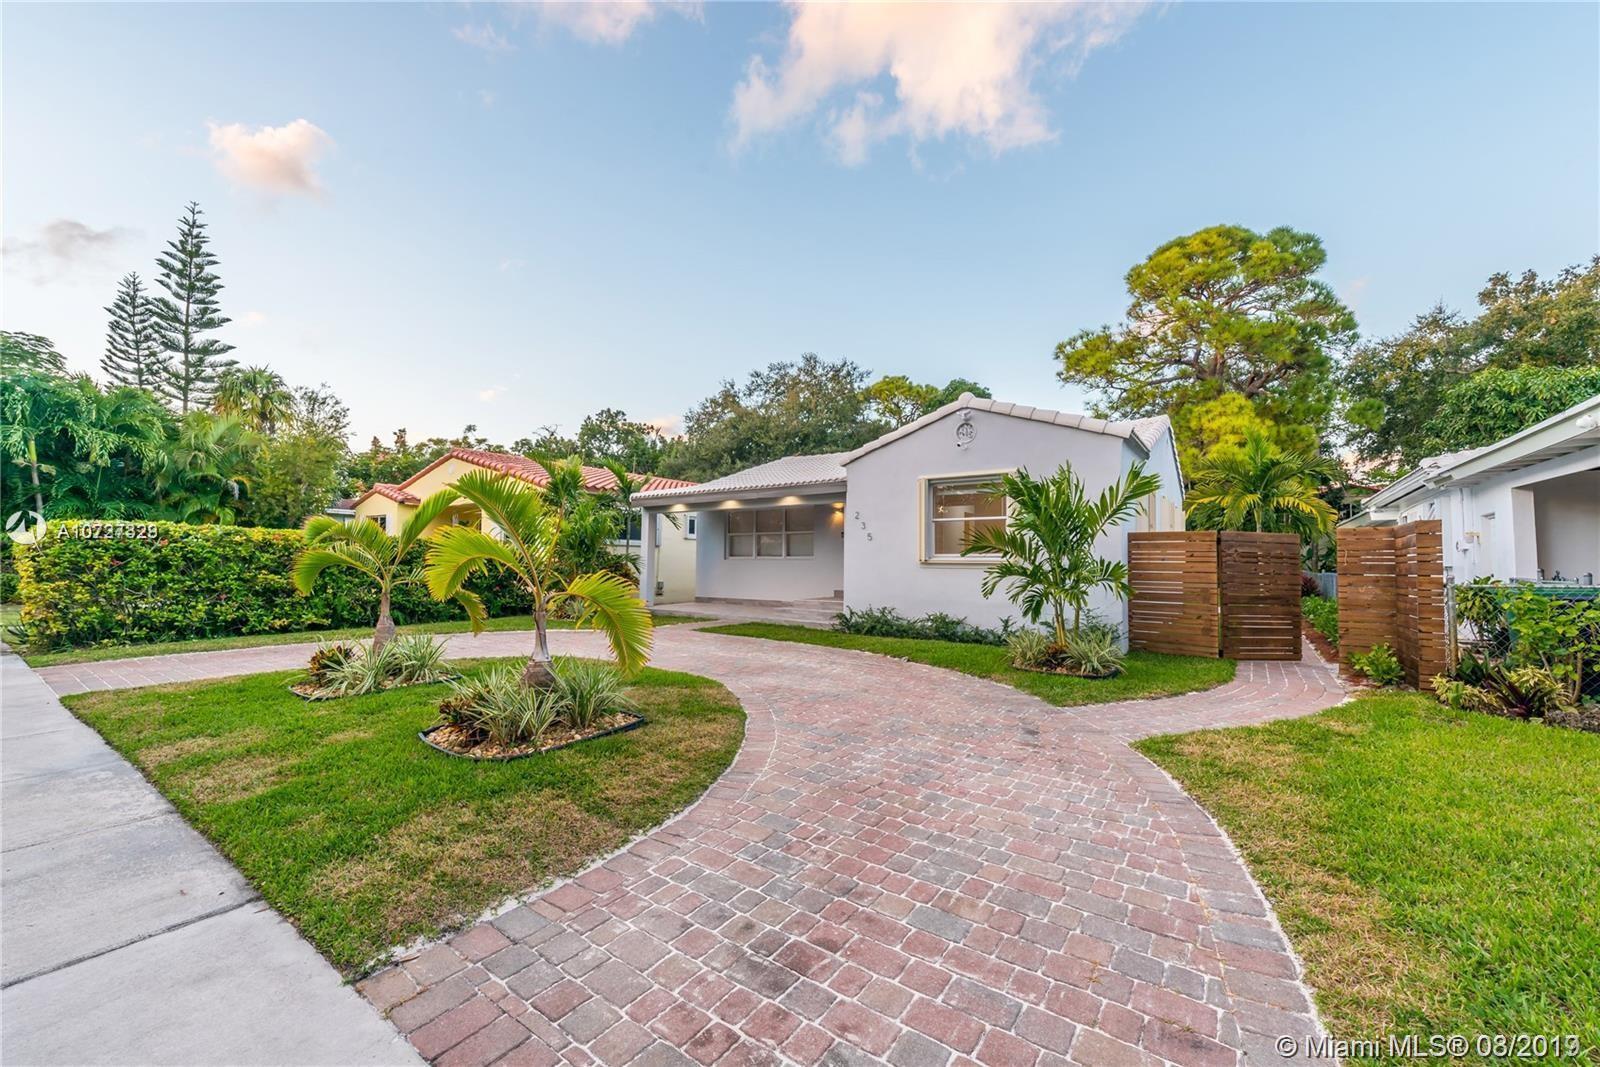 Homes for Sale in Zip Code 33138